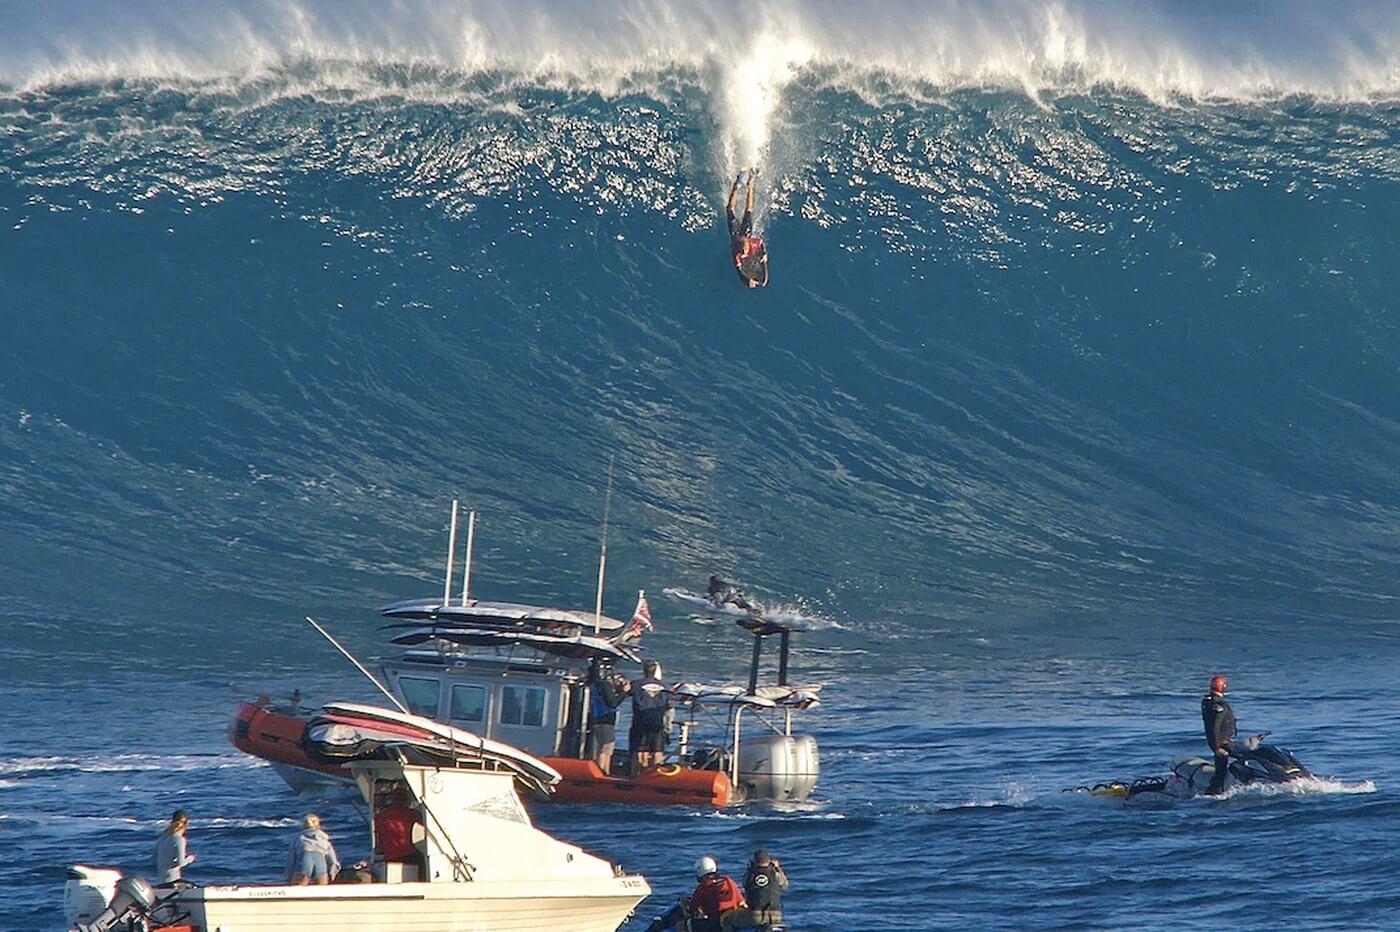 Ambler Bodyboarder Dominates Big-Wave World